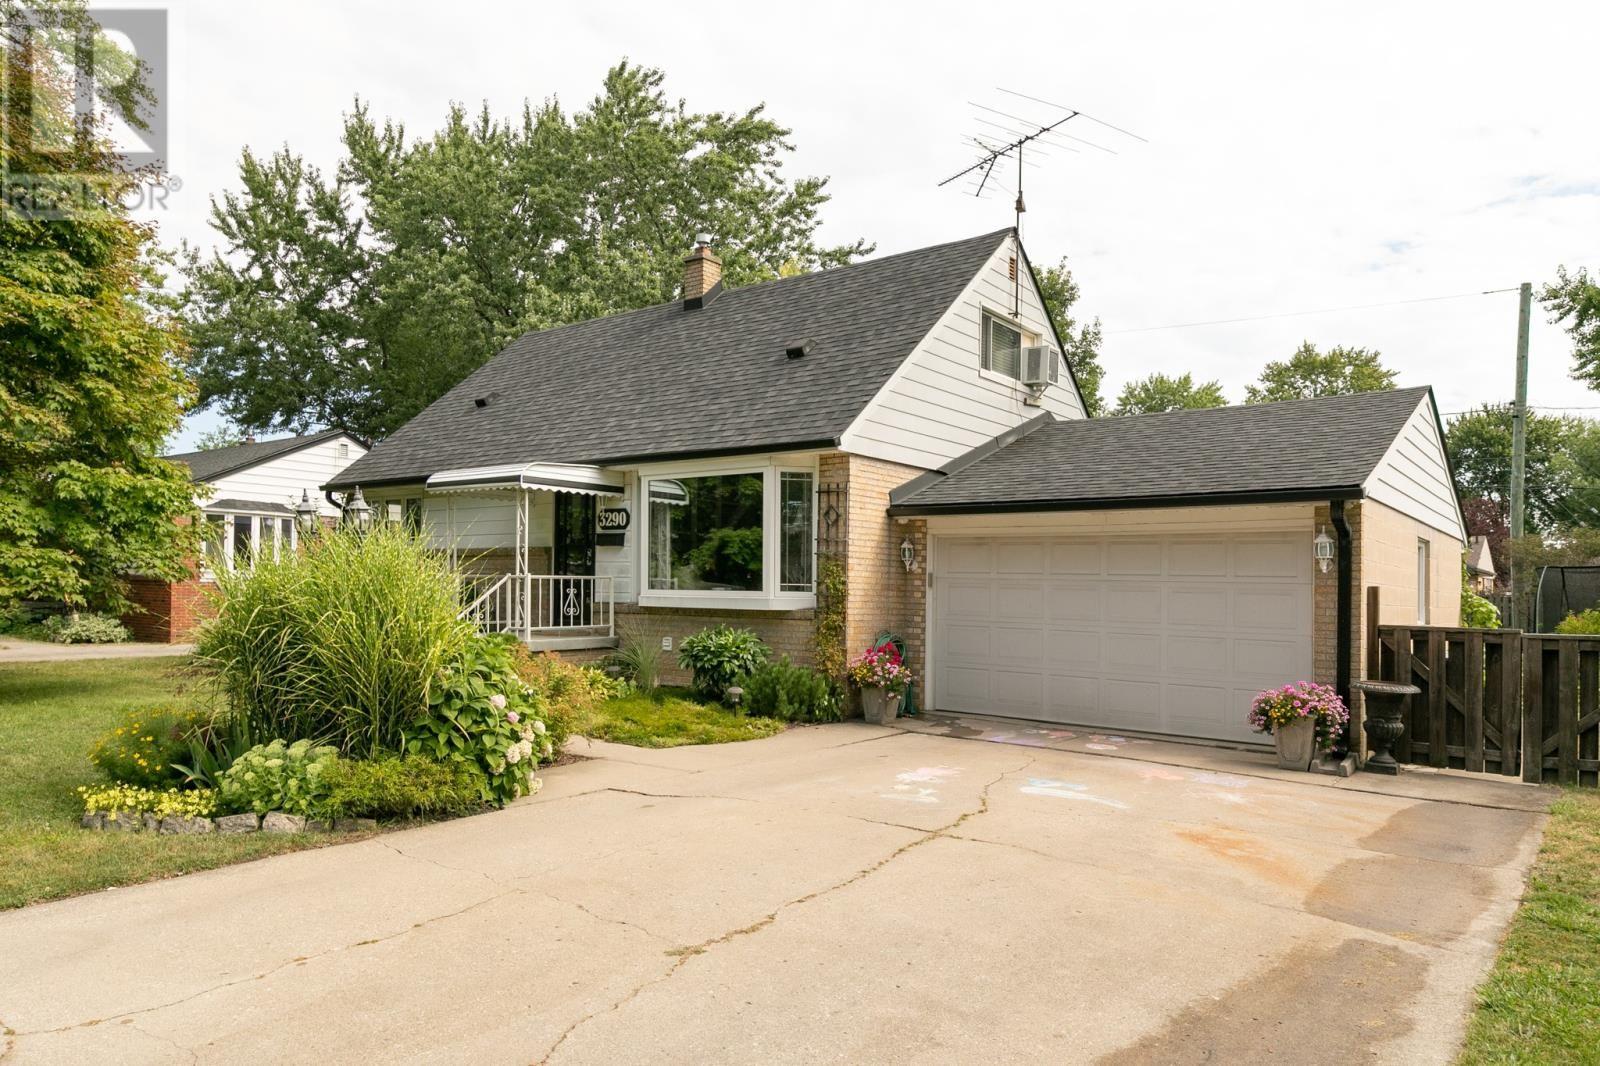 3290 DANDURAND 329,900.00 Windsor house, Home buying